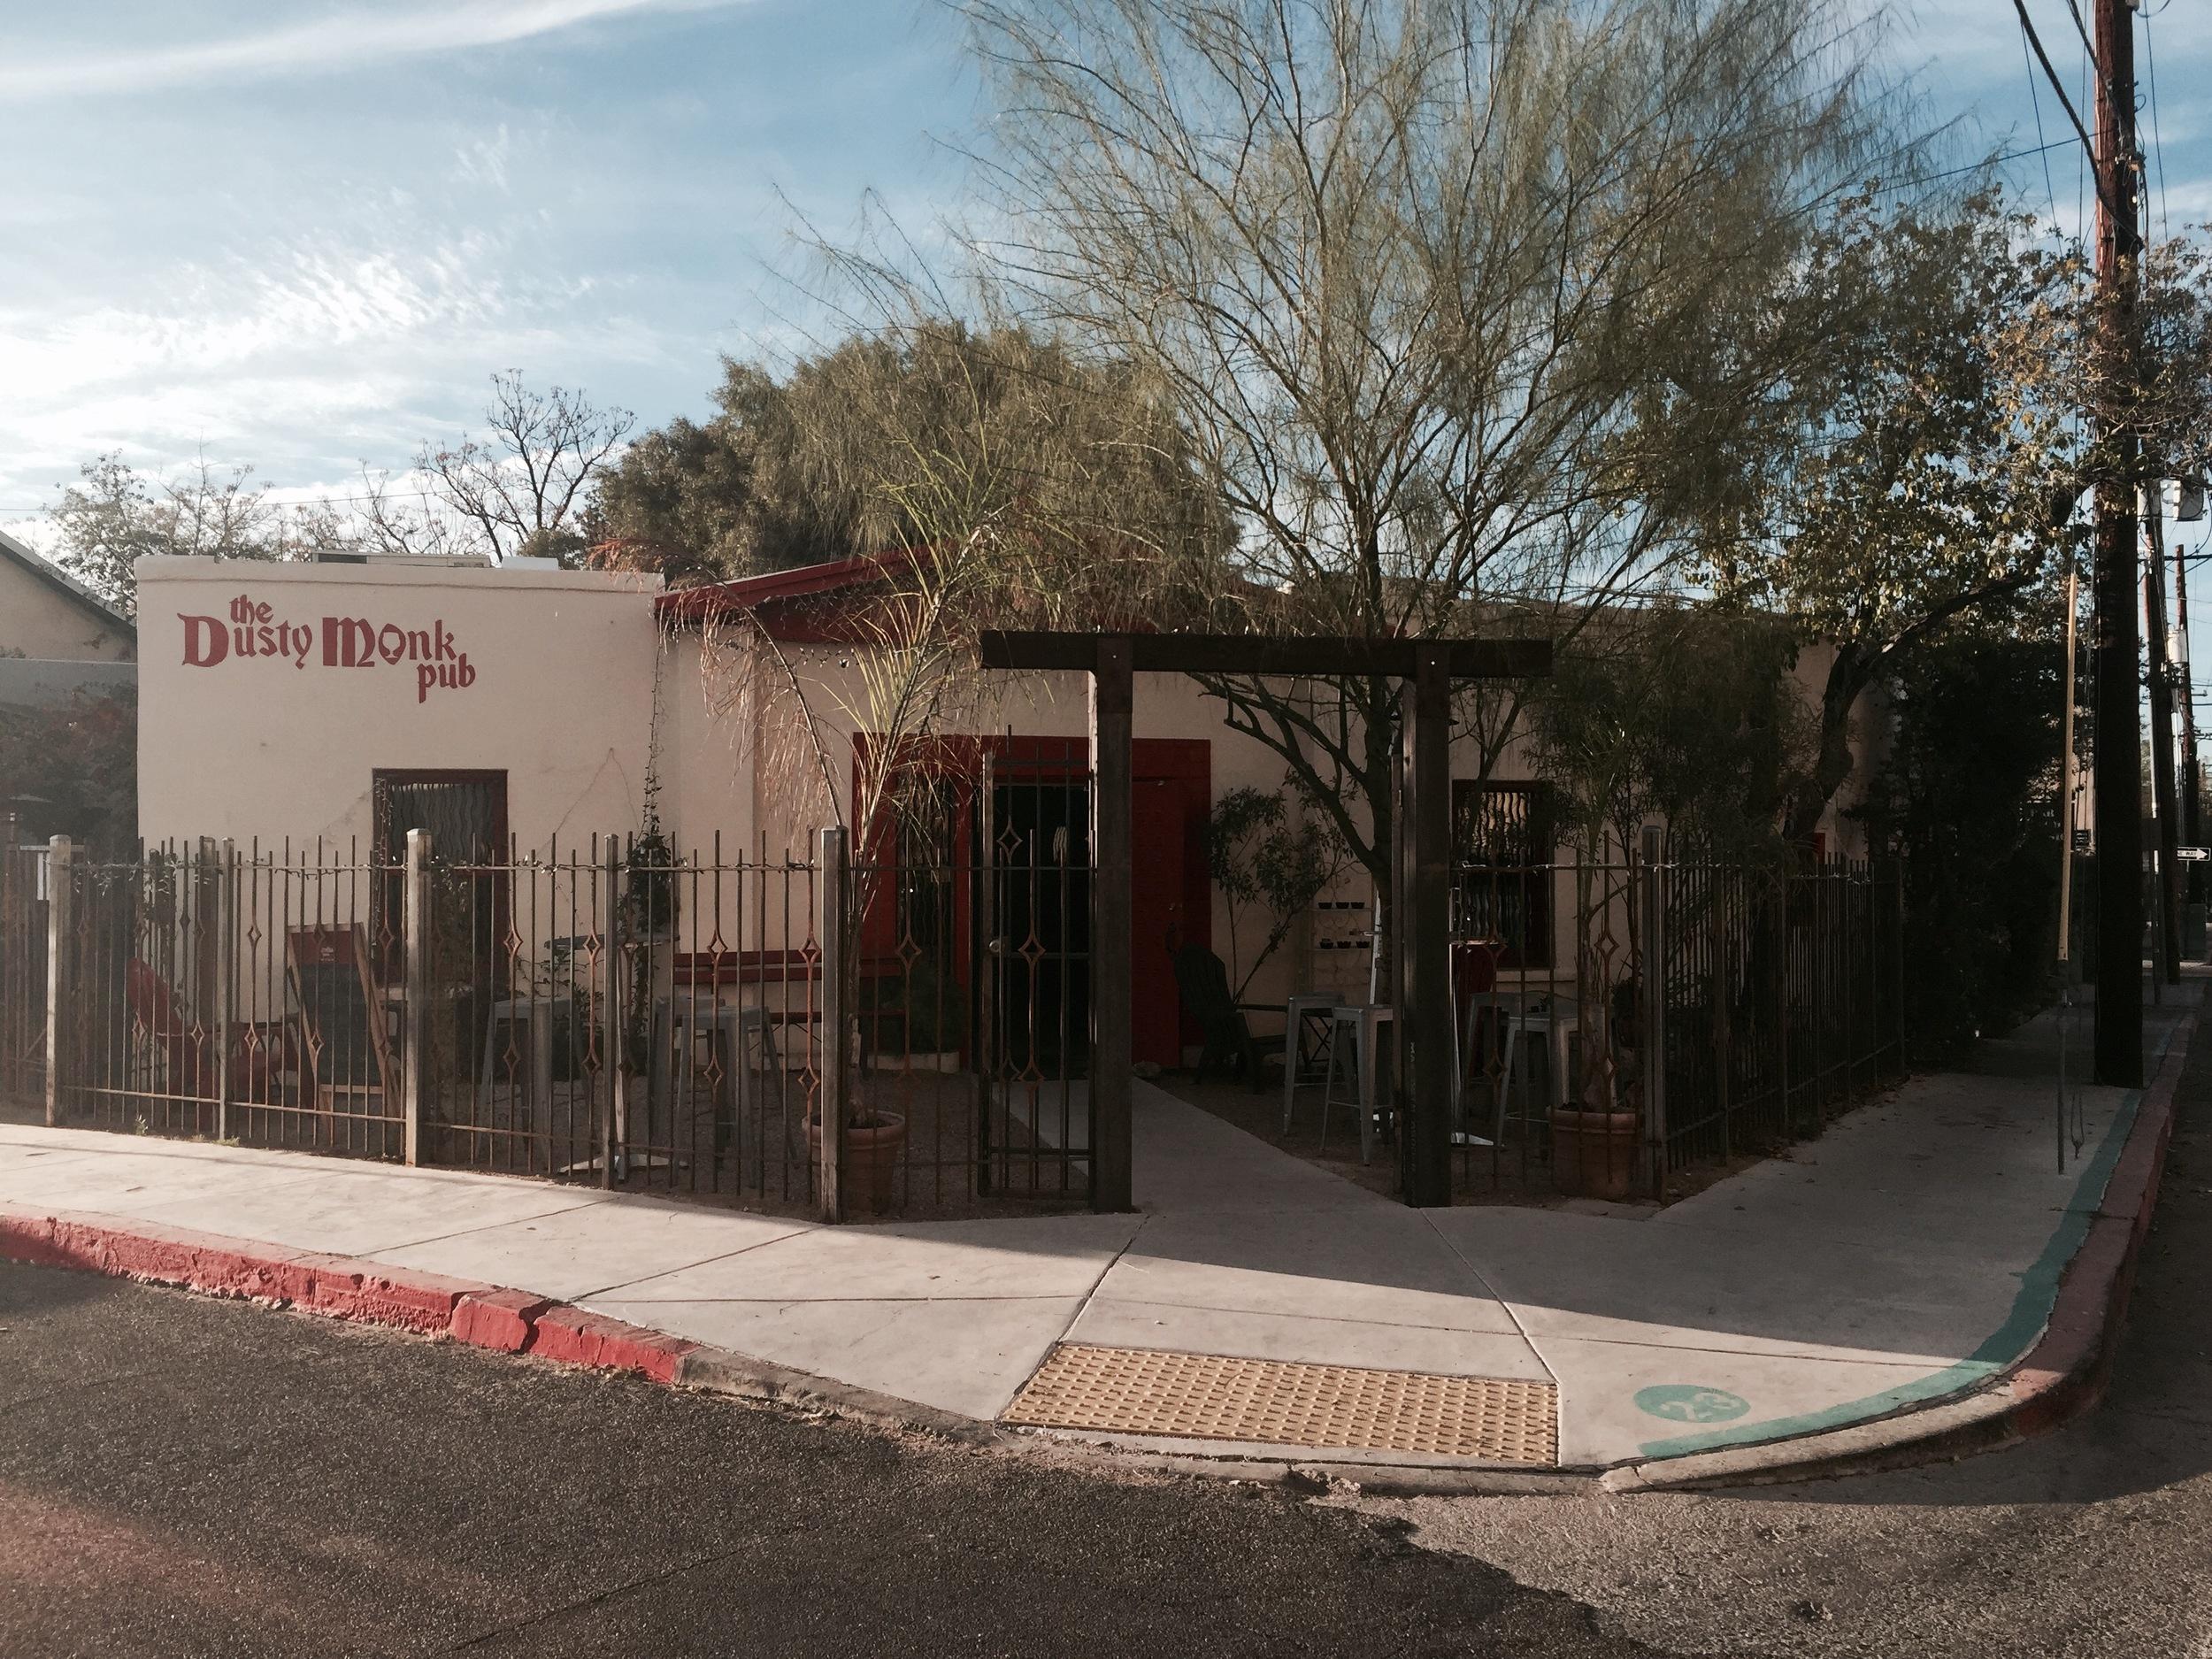 One of the entrances into La Cocina Restaurant | Tucson, AZ